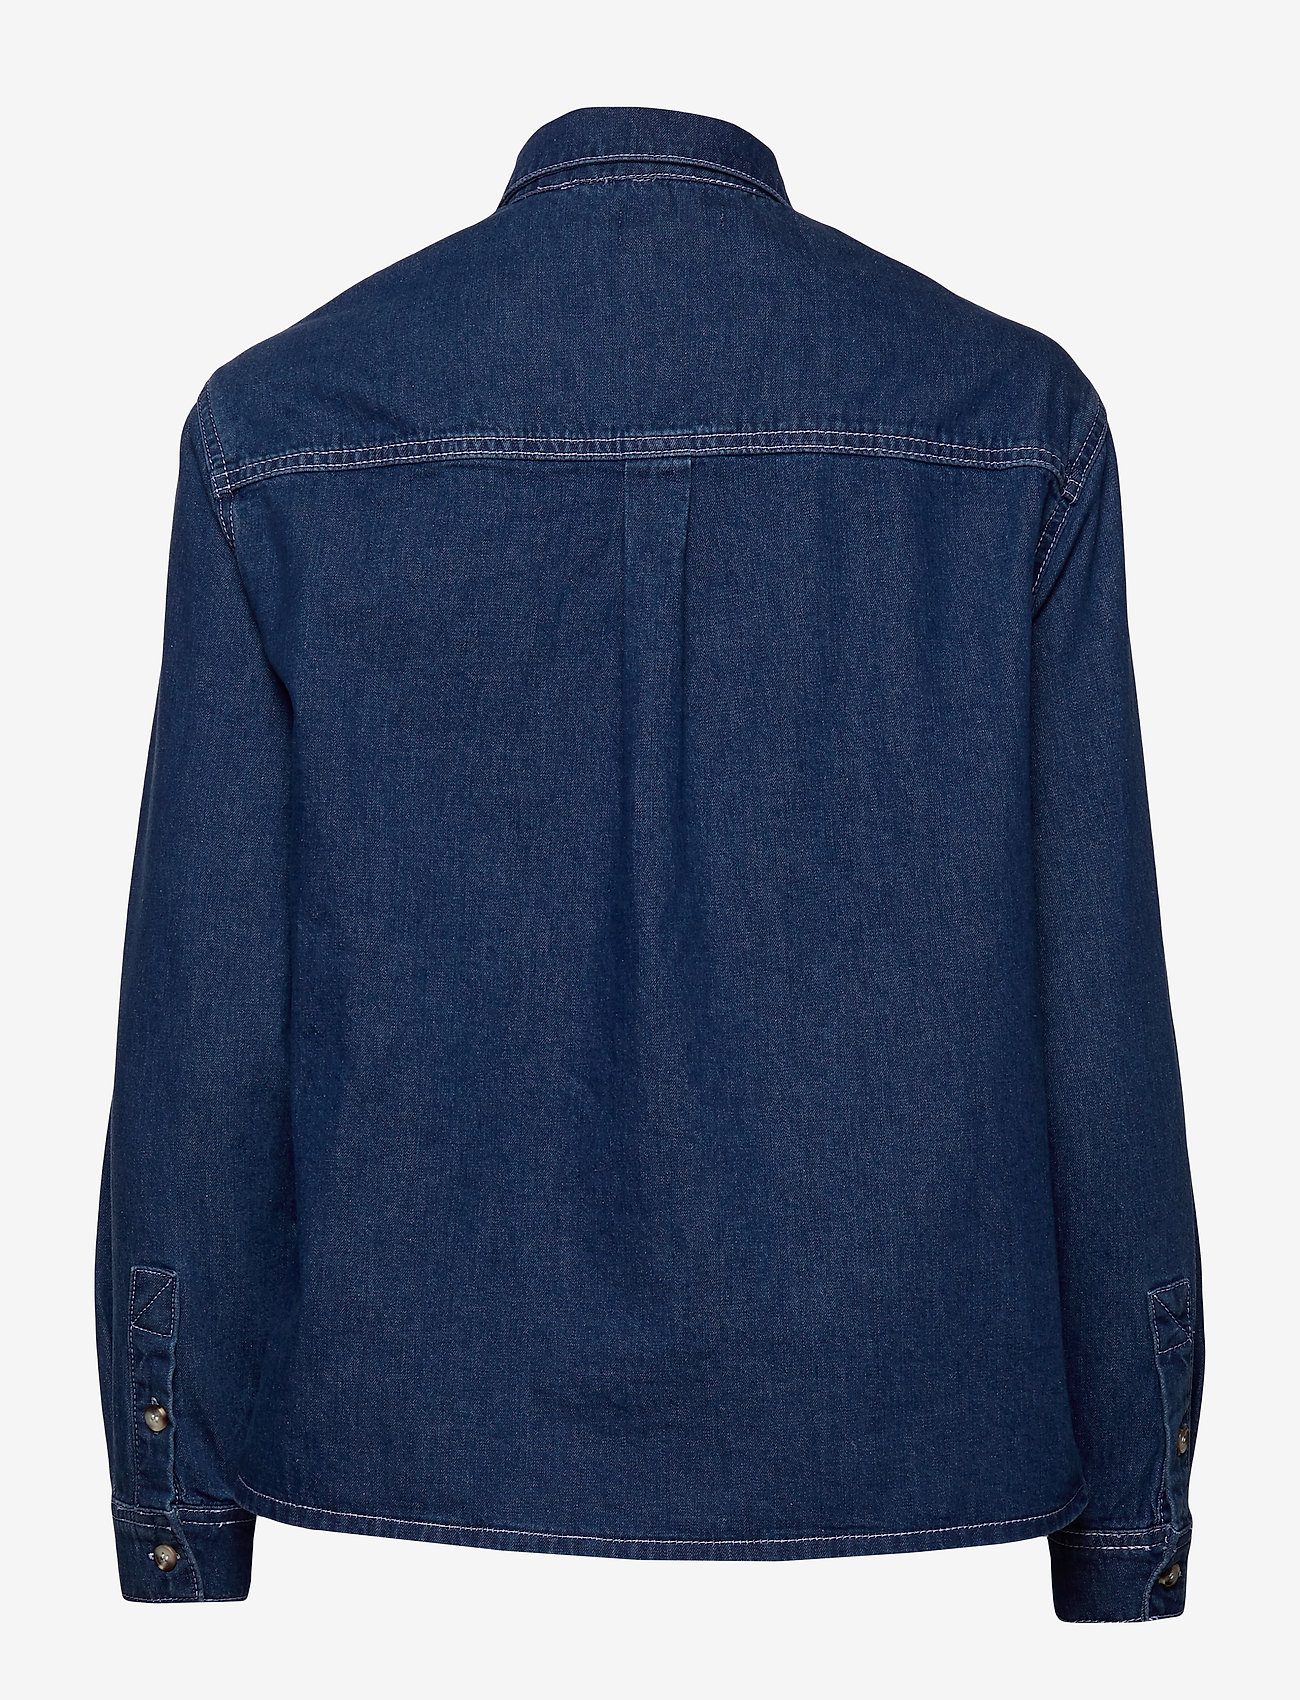 Superdry - ALCHEMY CLASSIC SHIRT - jeansblouses - denim indigo rinse - 1